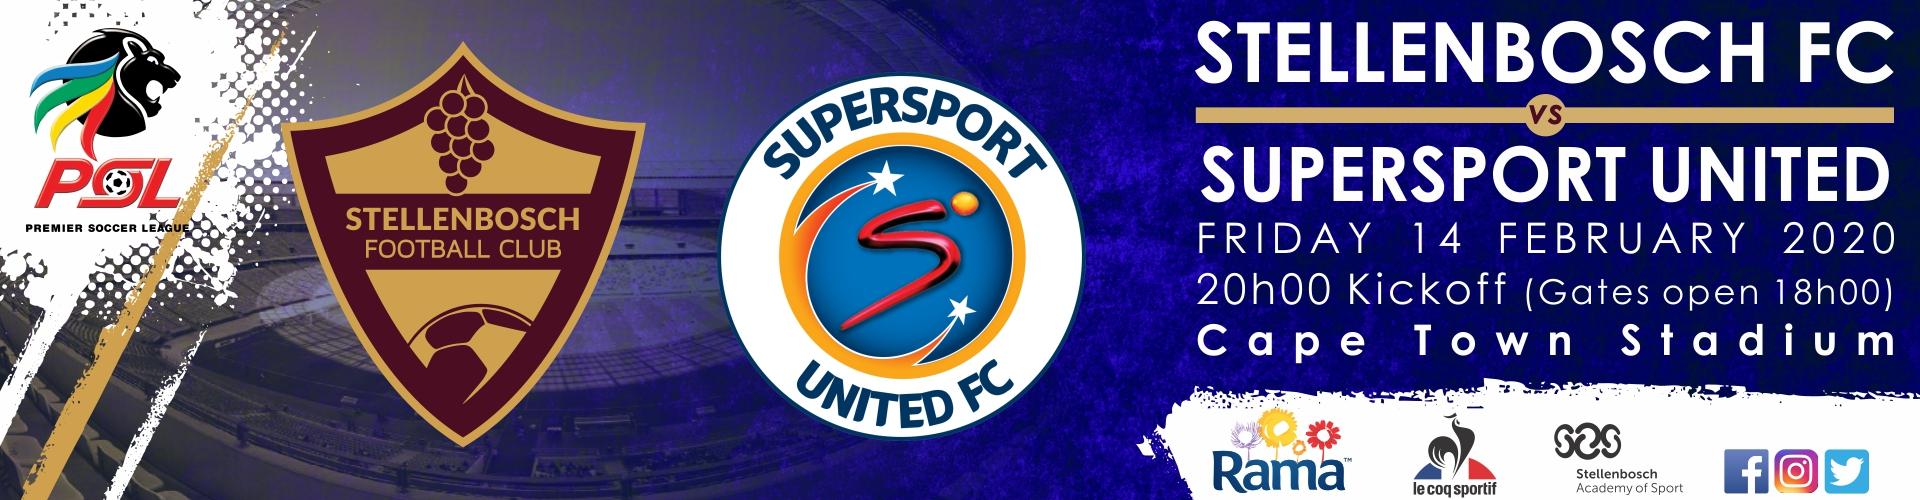 Stellenbosch vs Supersport